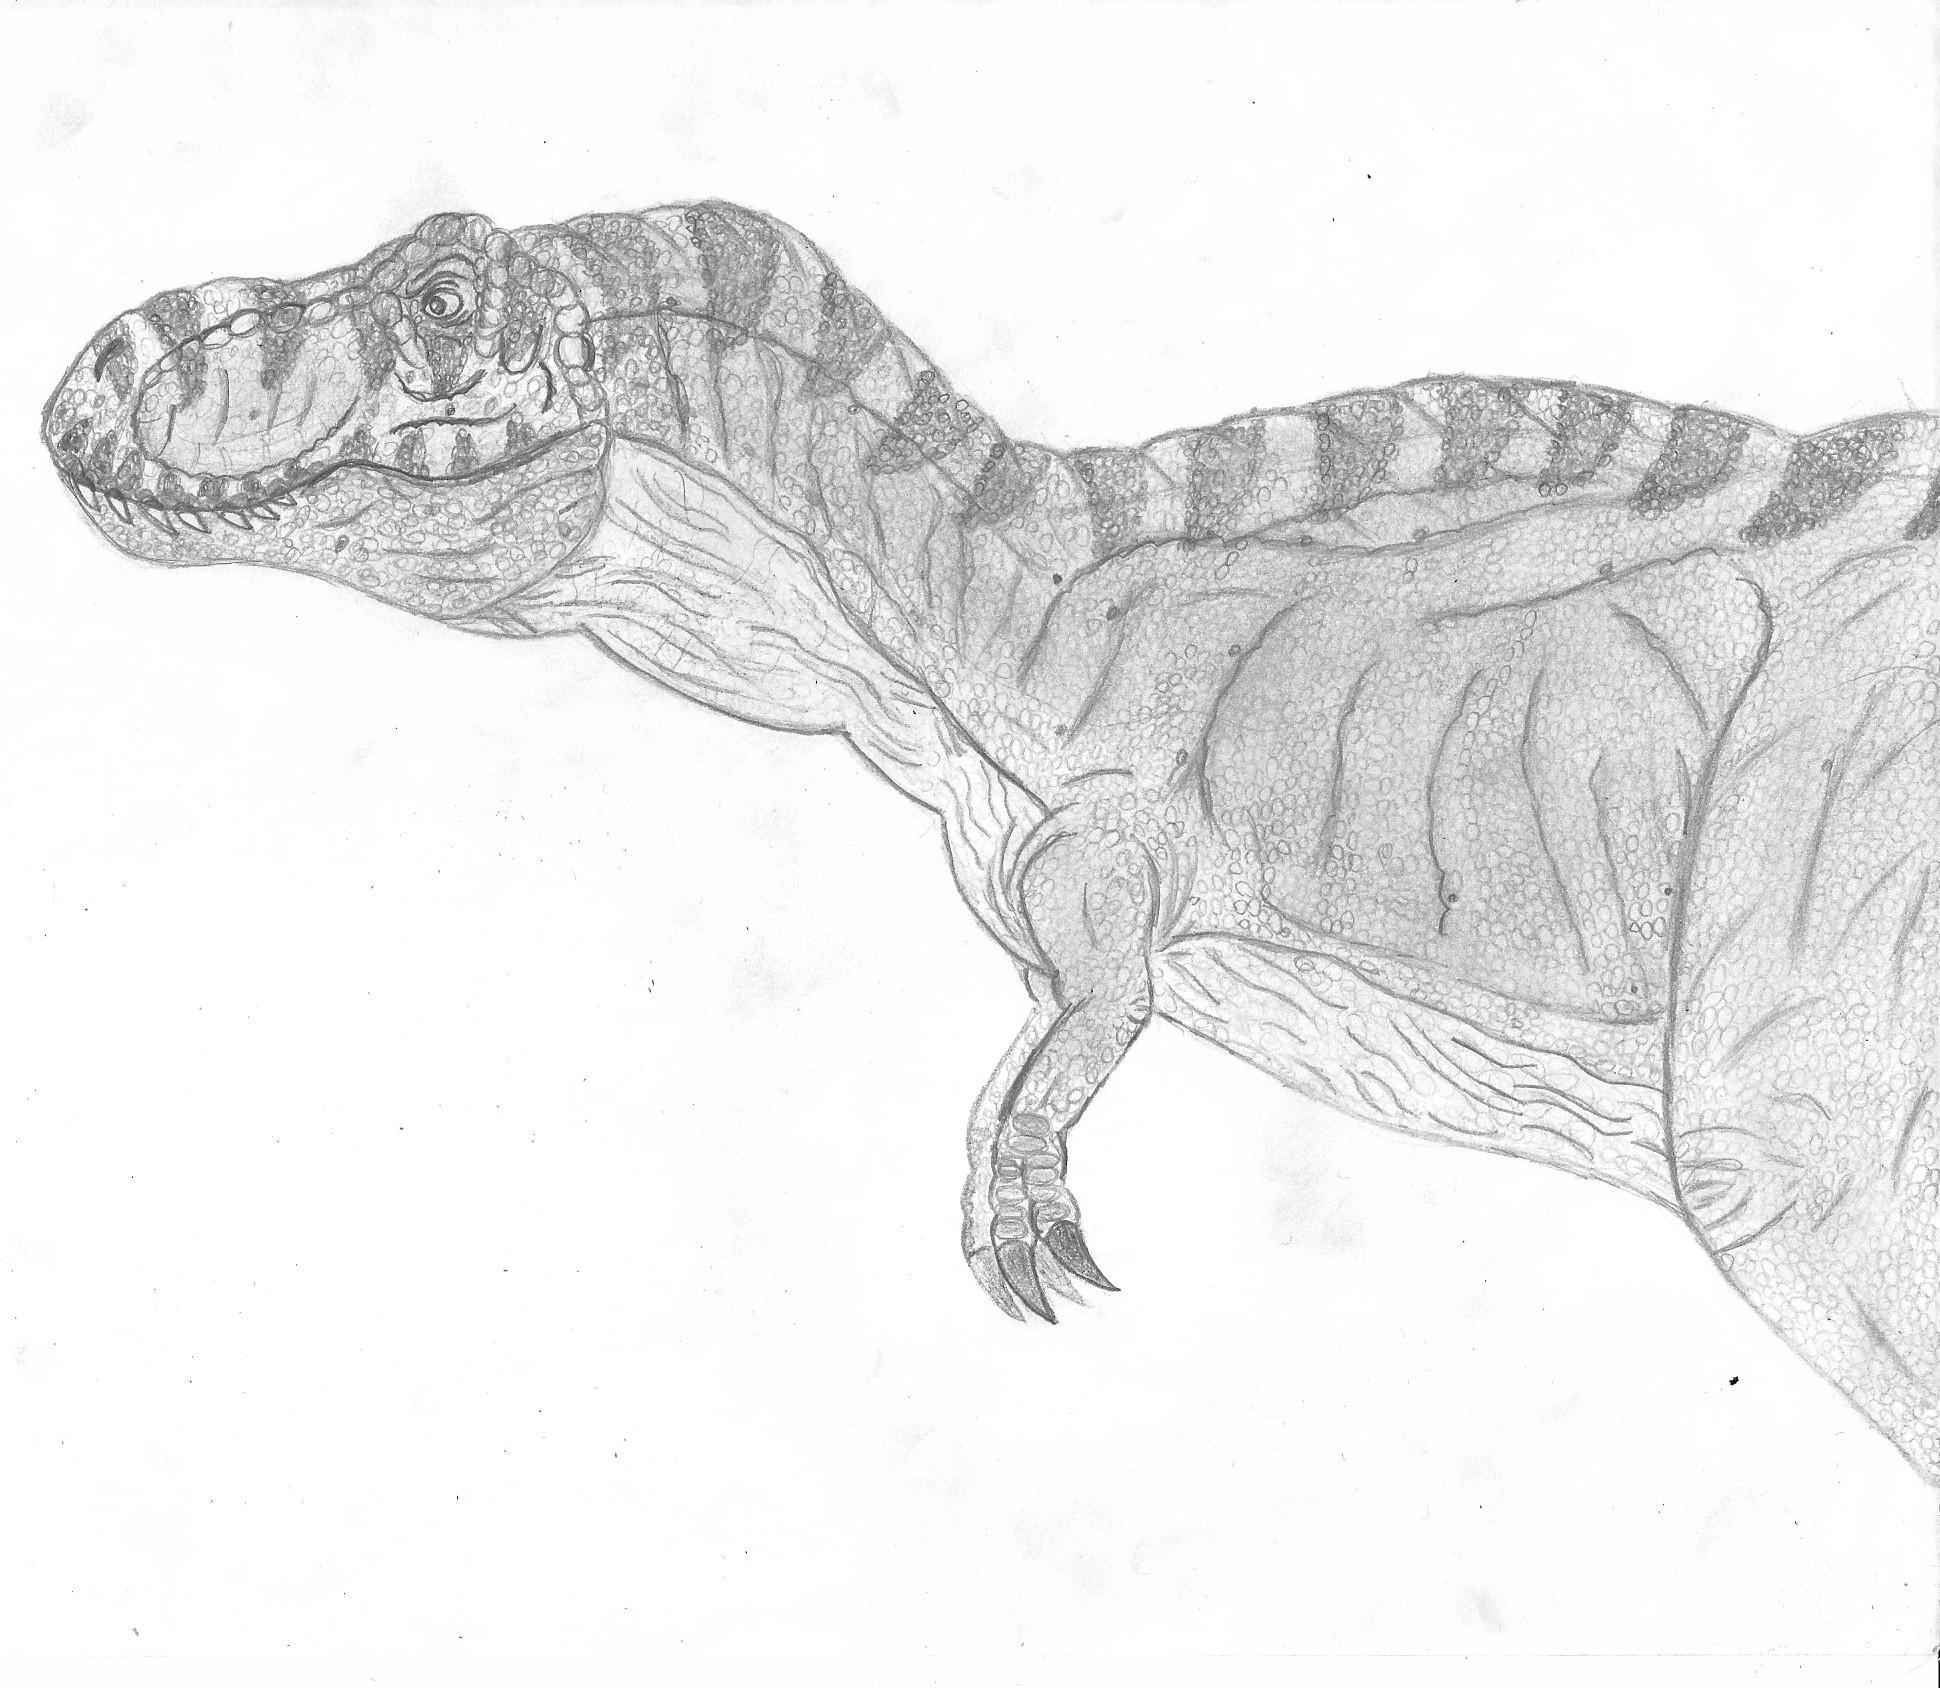 Coloriages imprimer t rex num ro 758616 - Dessin dinosaure t rex ...